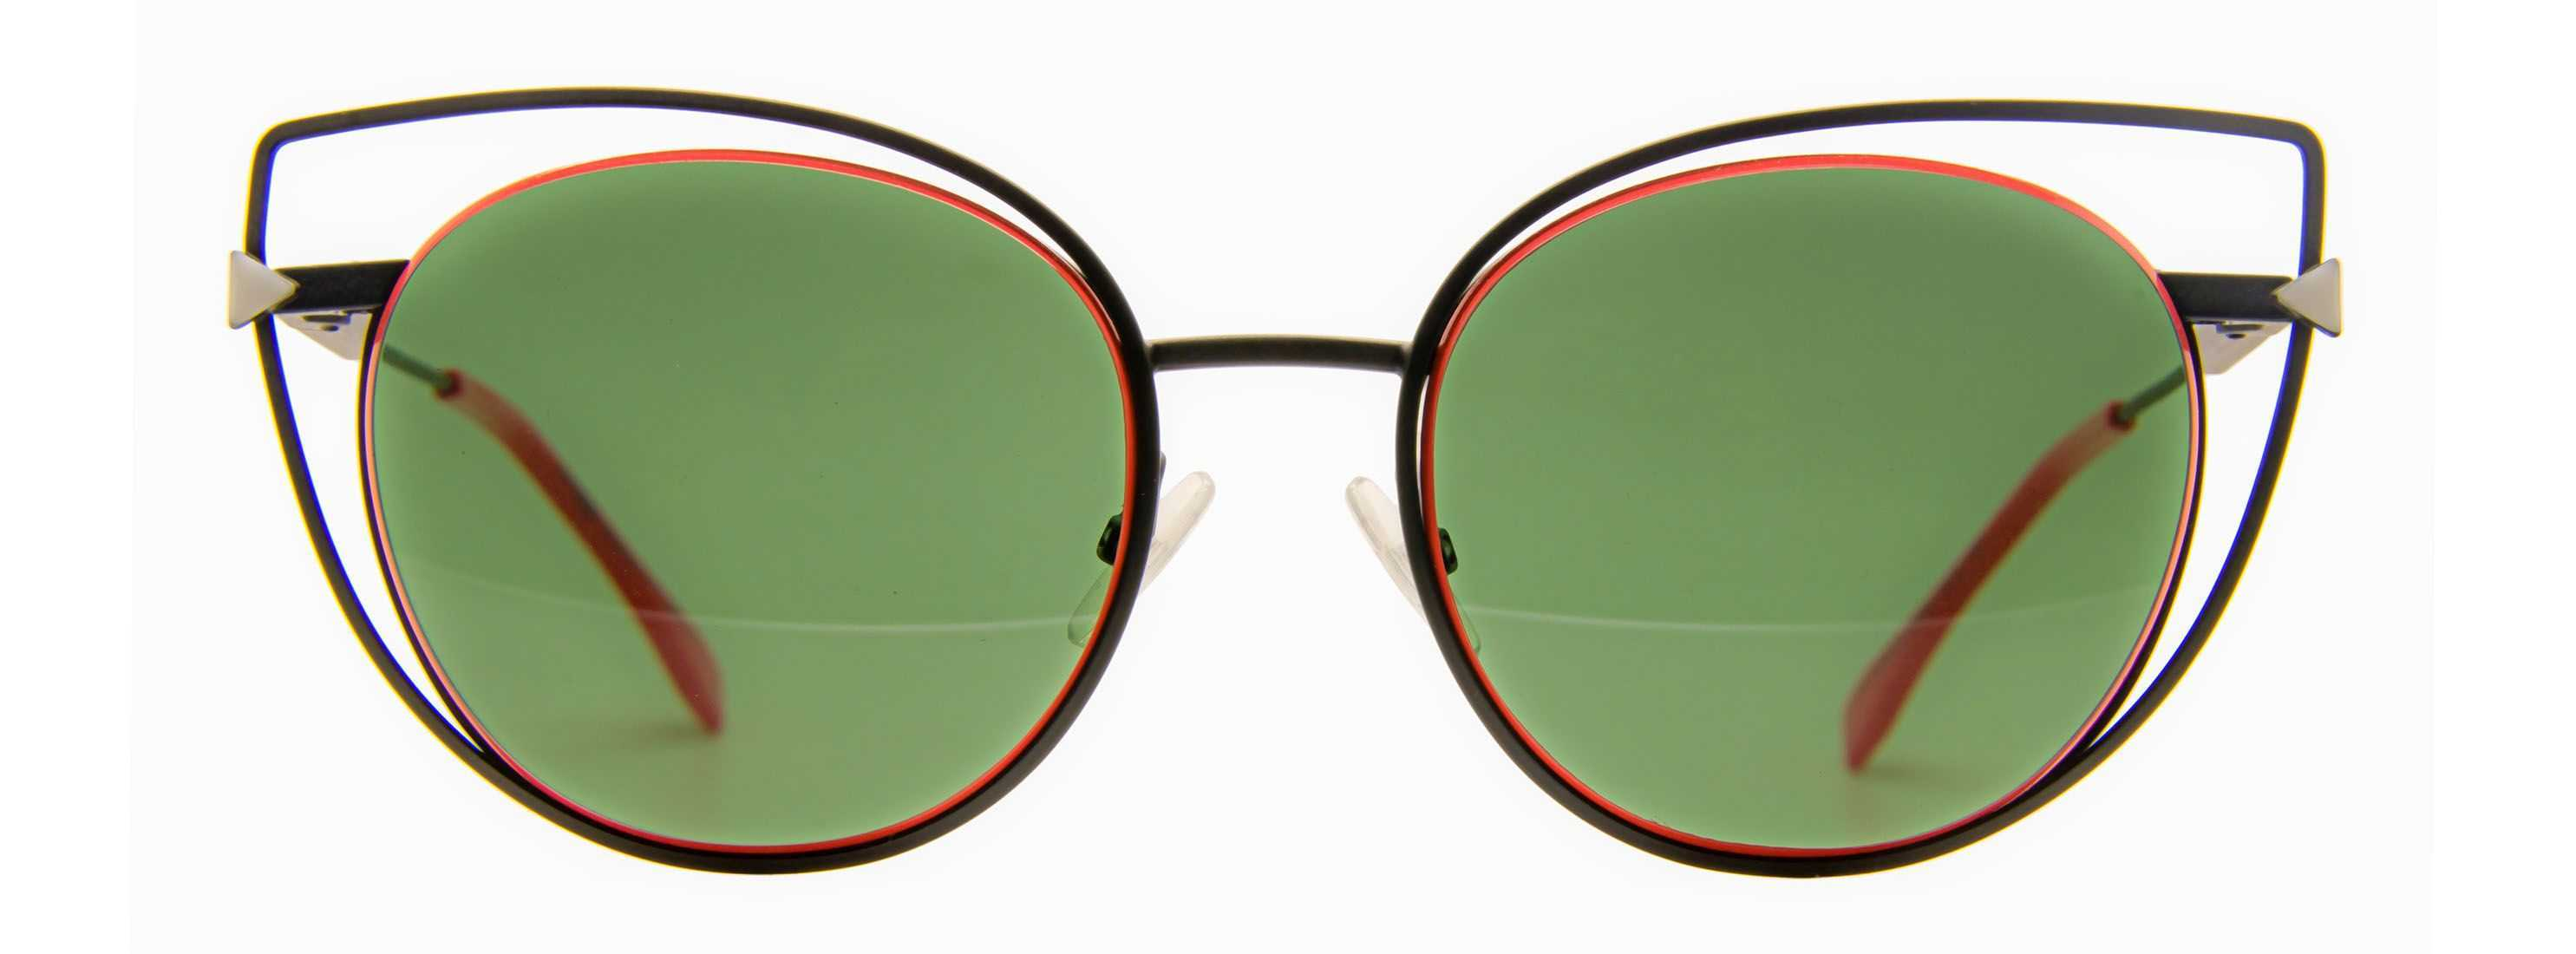 Fendi sunglasses 0176 003 01 2970x1100